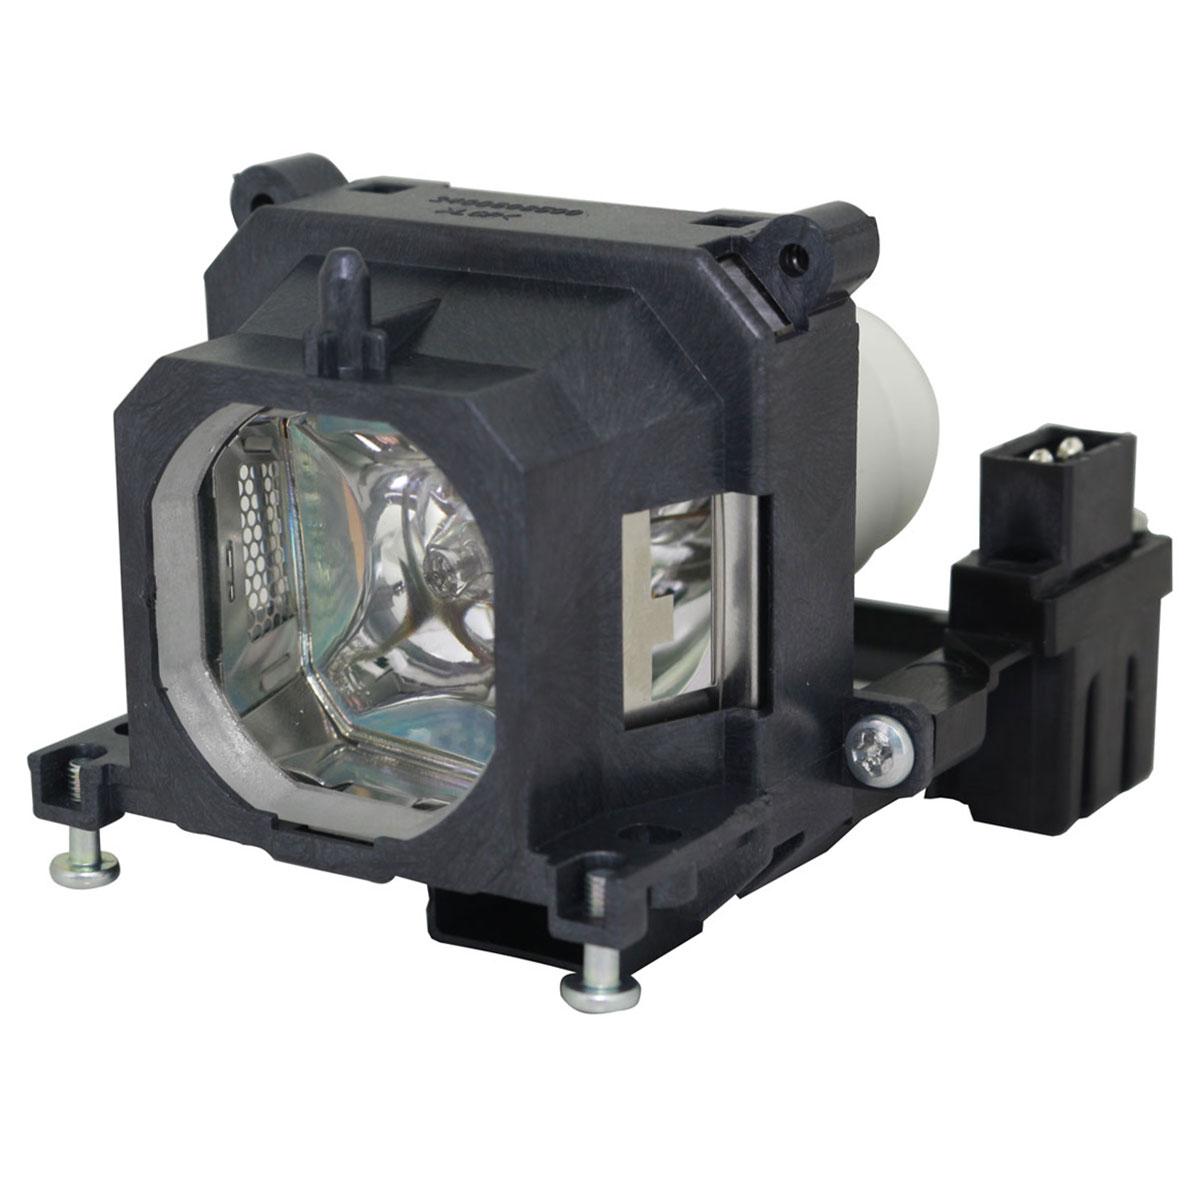 ACTO 1300052500 FP Lamp